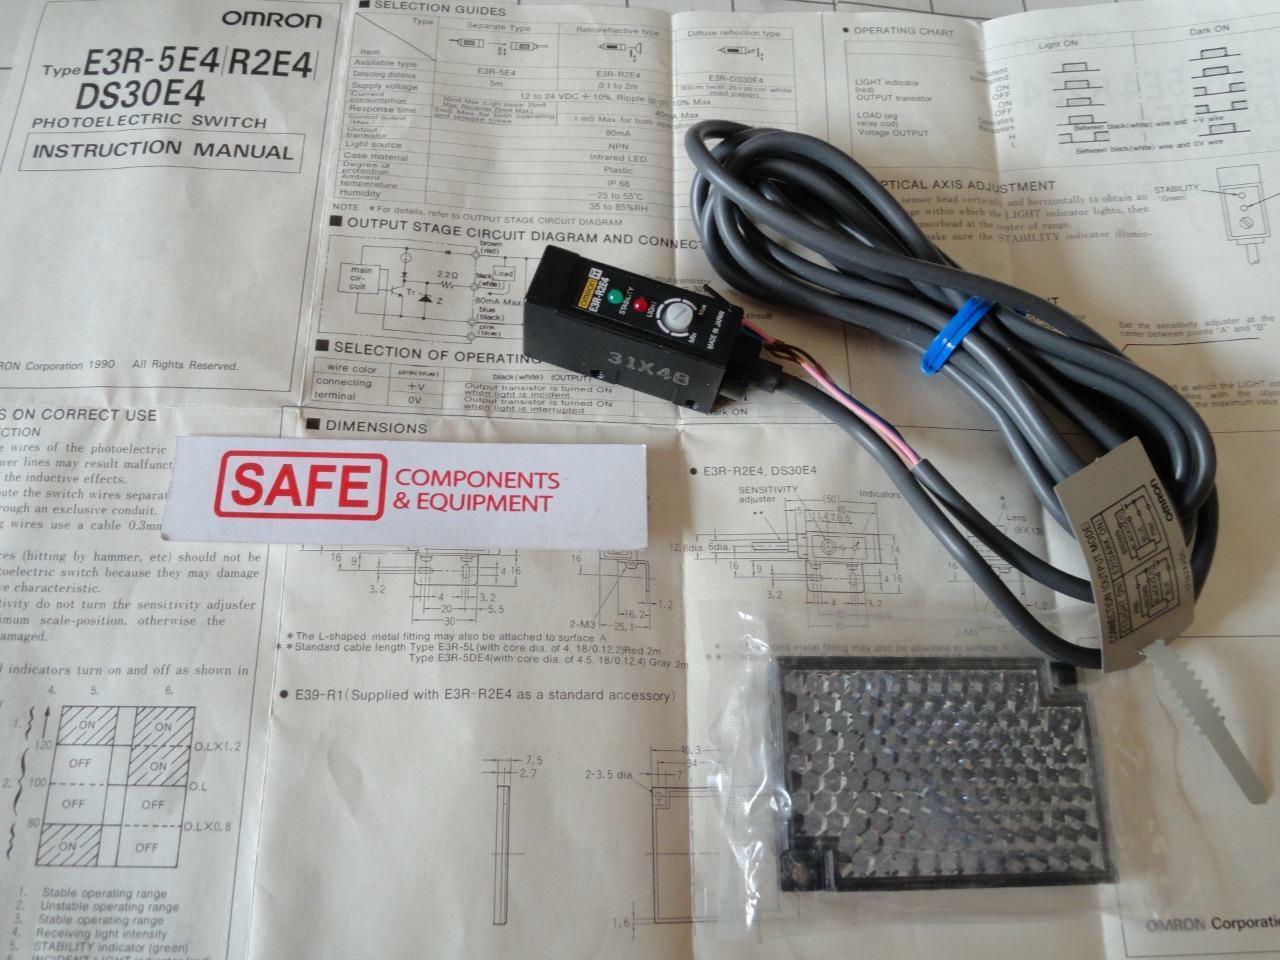 OMRON Photoelectric Sensor Switch E3R-R2E4 Retroreflective 0.1-2m 12-24VDC Q45-1